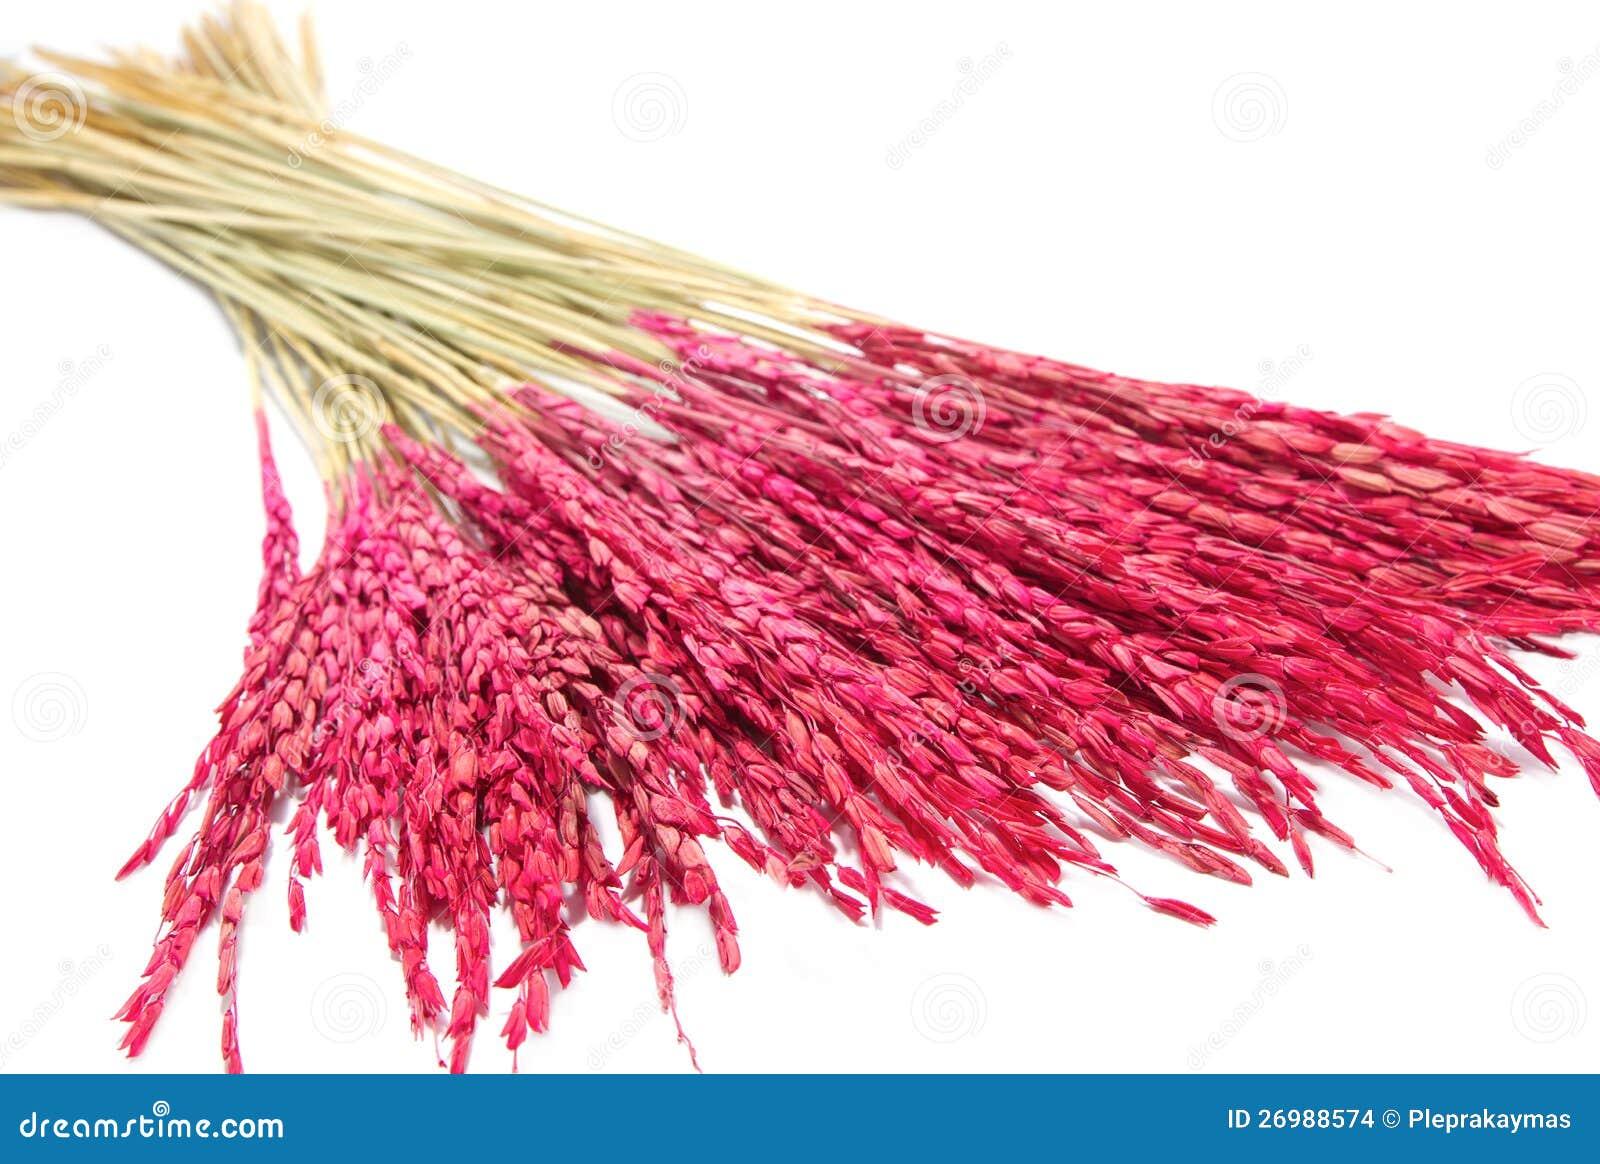 Close up pink paddy rice dry flower decoration stock photo image close up pink paddy rice dry flower decoration stock photo image of dead arrangement 26988574 mightylinksfo